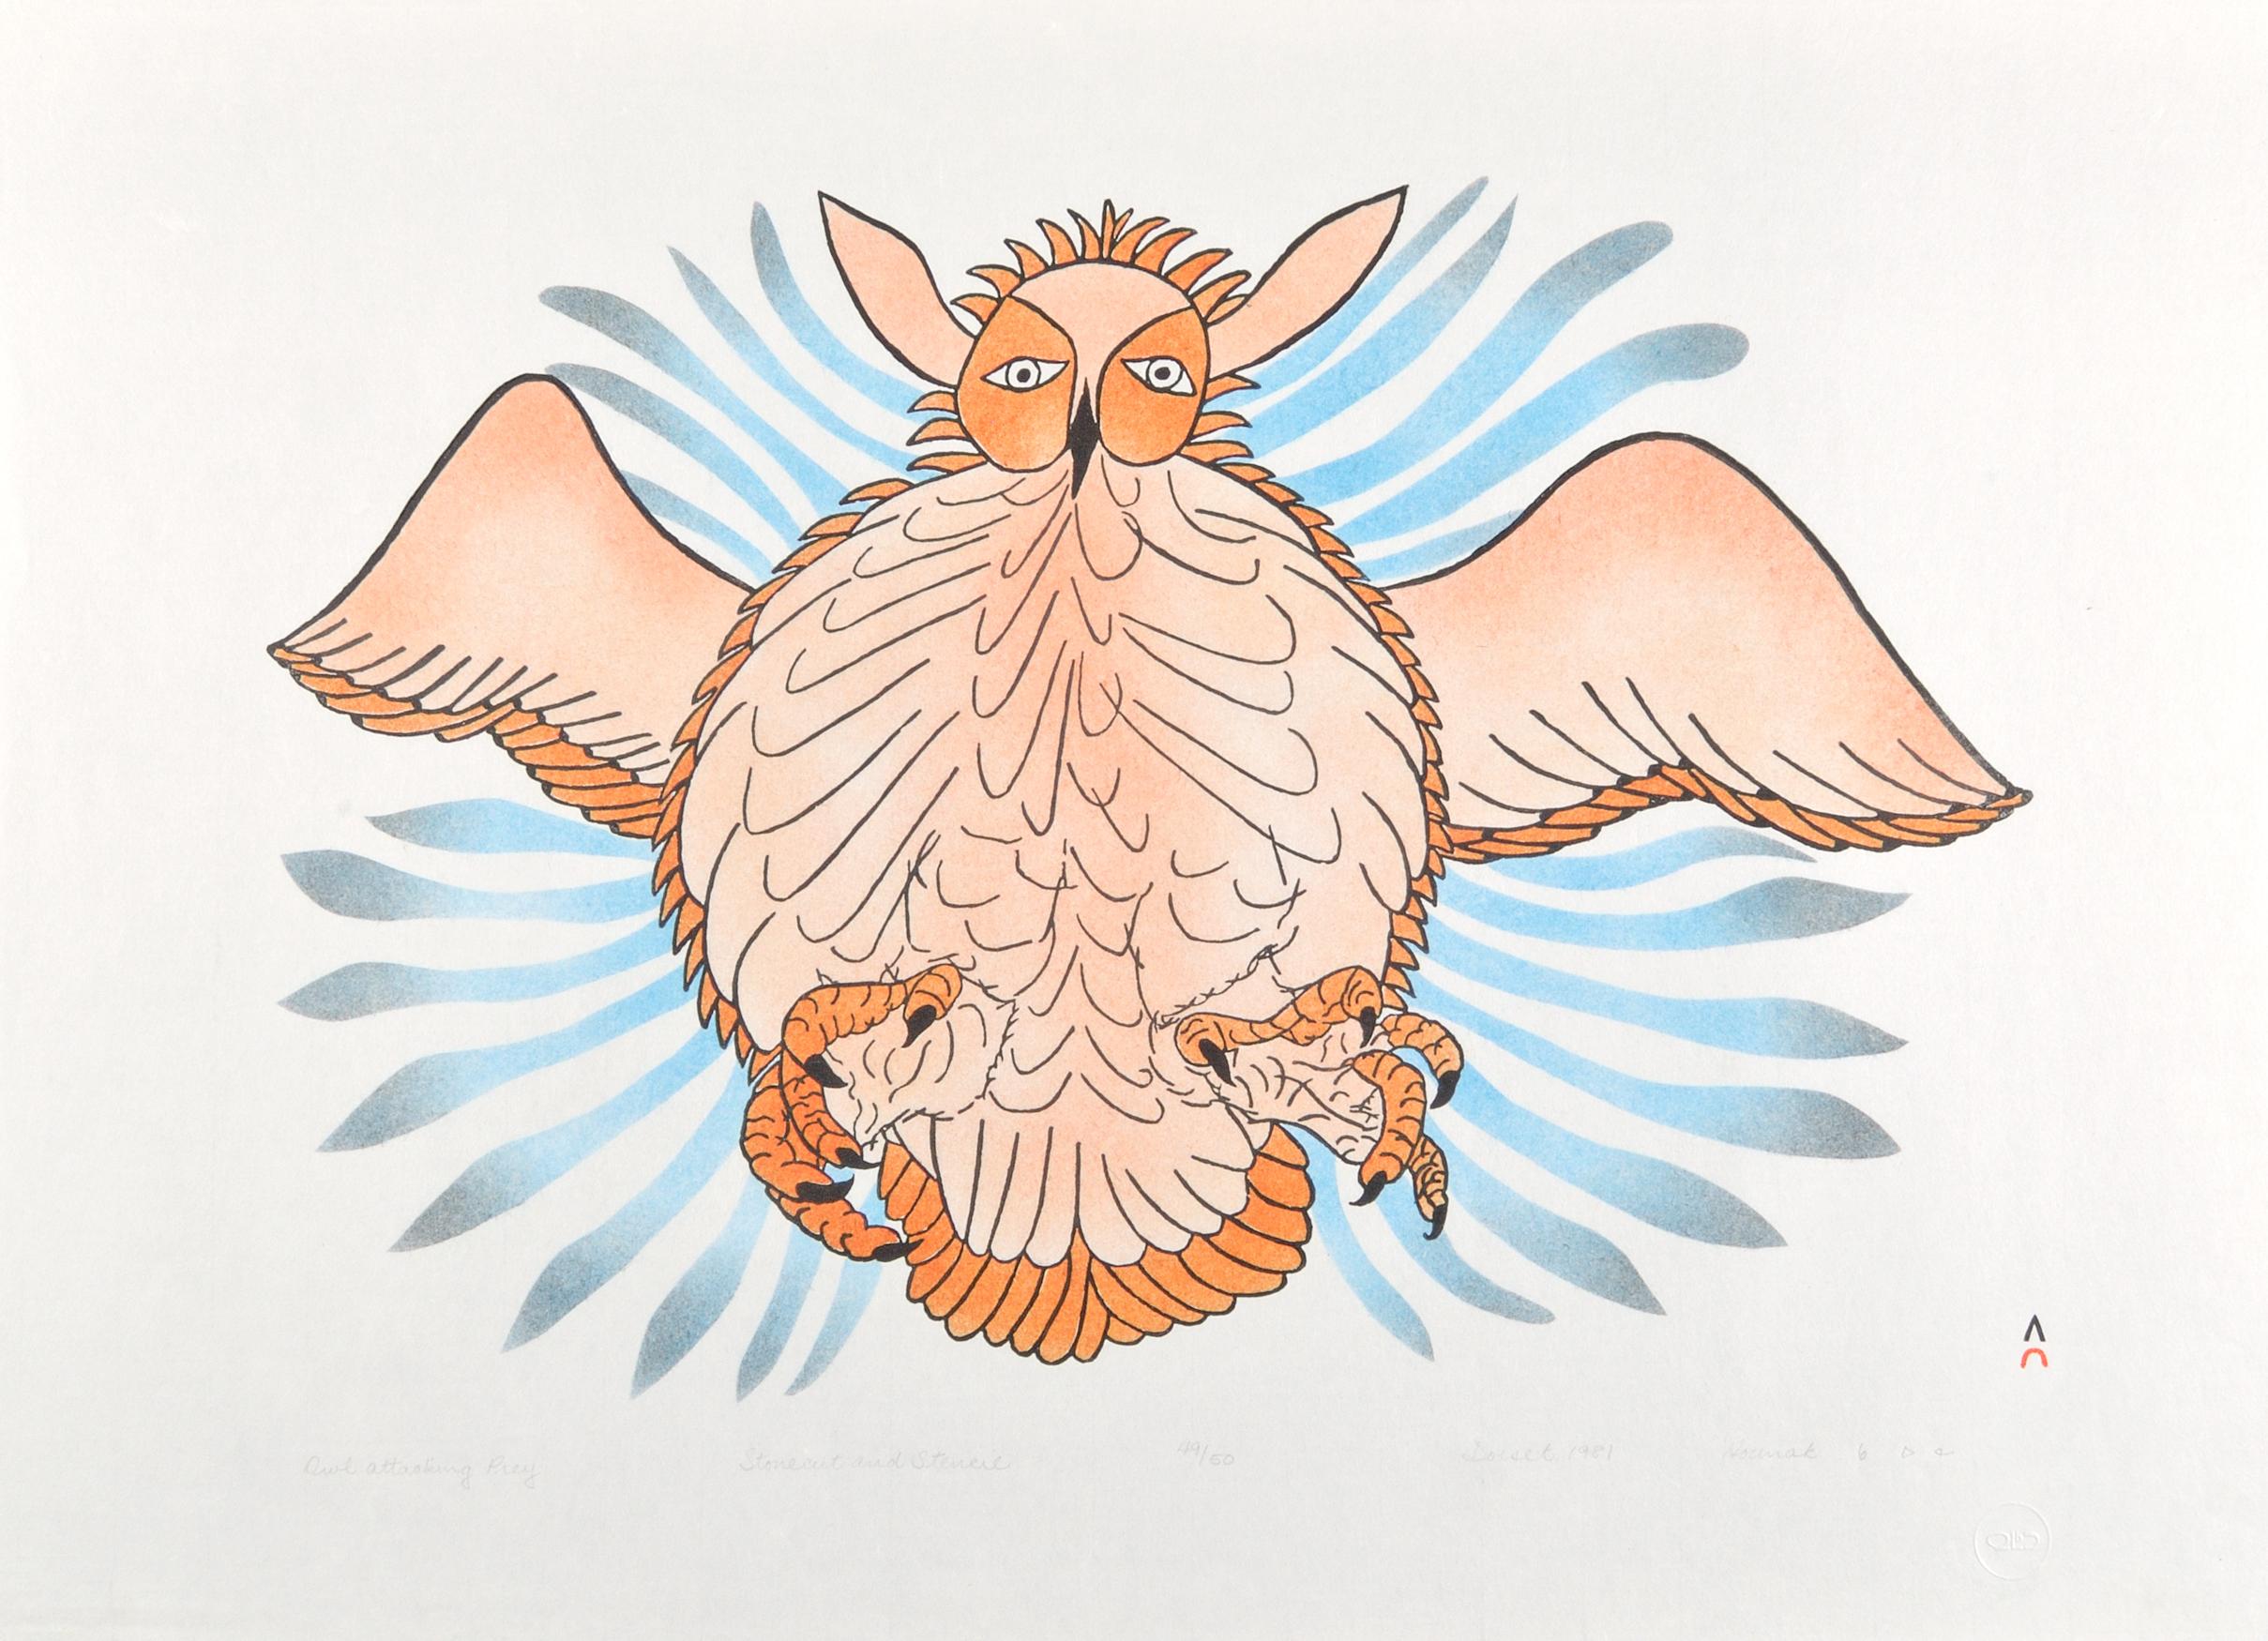 Haunak Mikkigak  OWL ATTACKING PREY Stonecut & Stencil 1981 63 x 86 cm $275.00 CDN Released in the 1981 collection Dorset ID#: 81-09